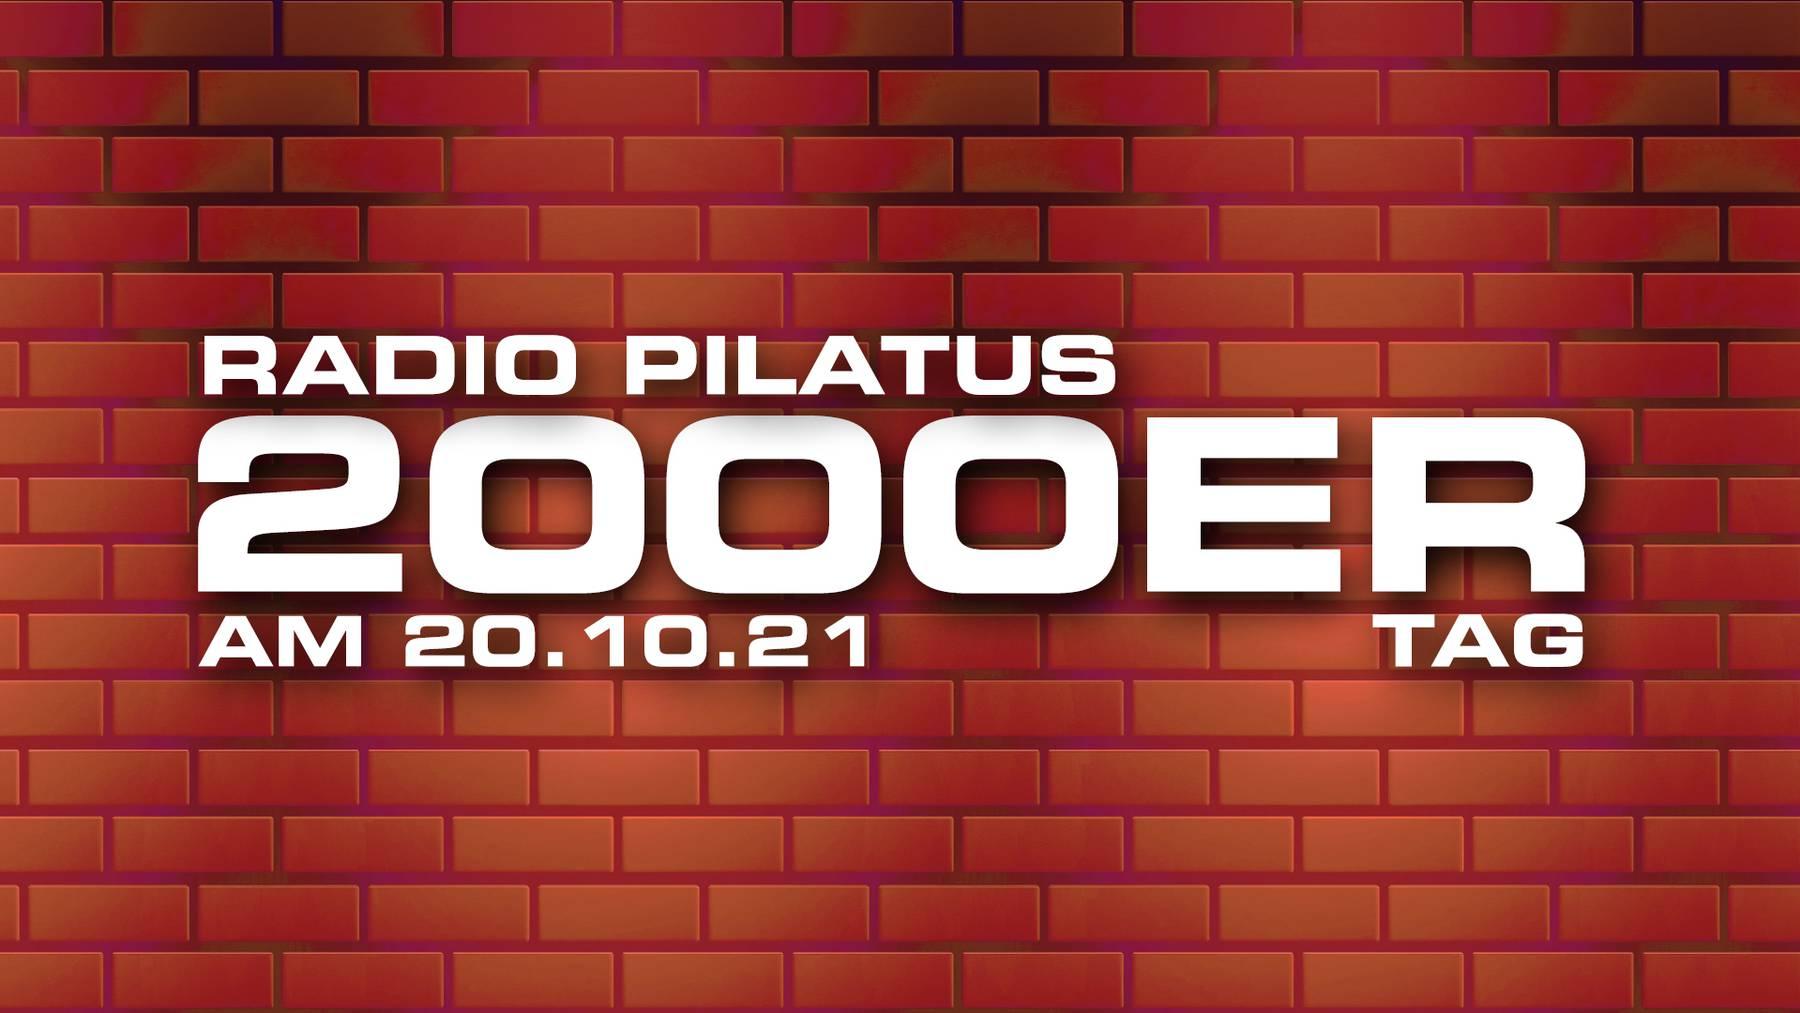 Radio Pilatus 2000er-Tag